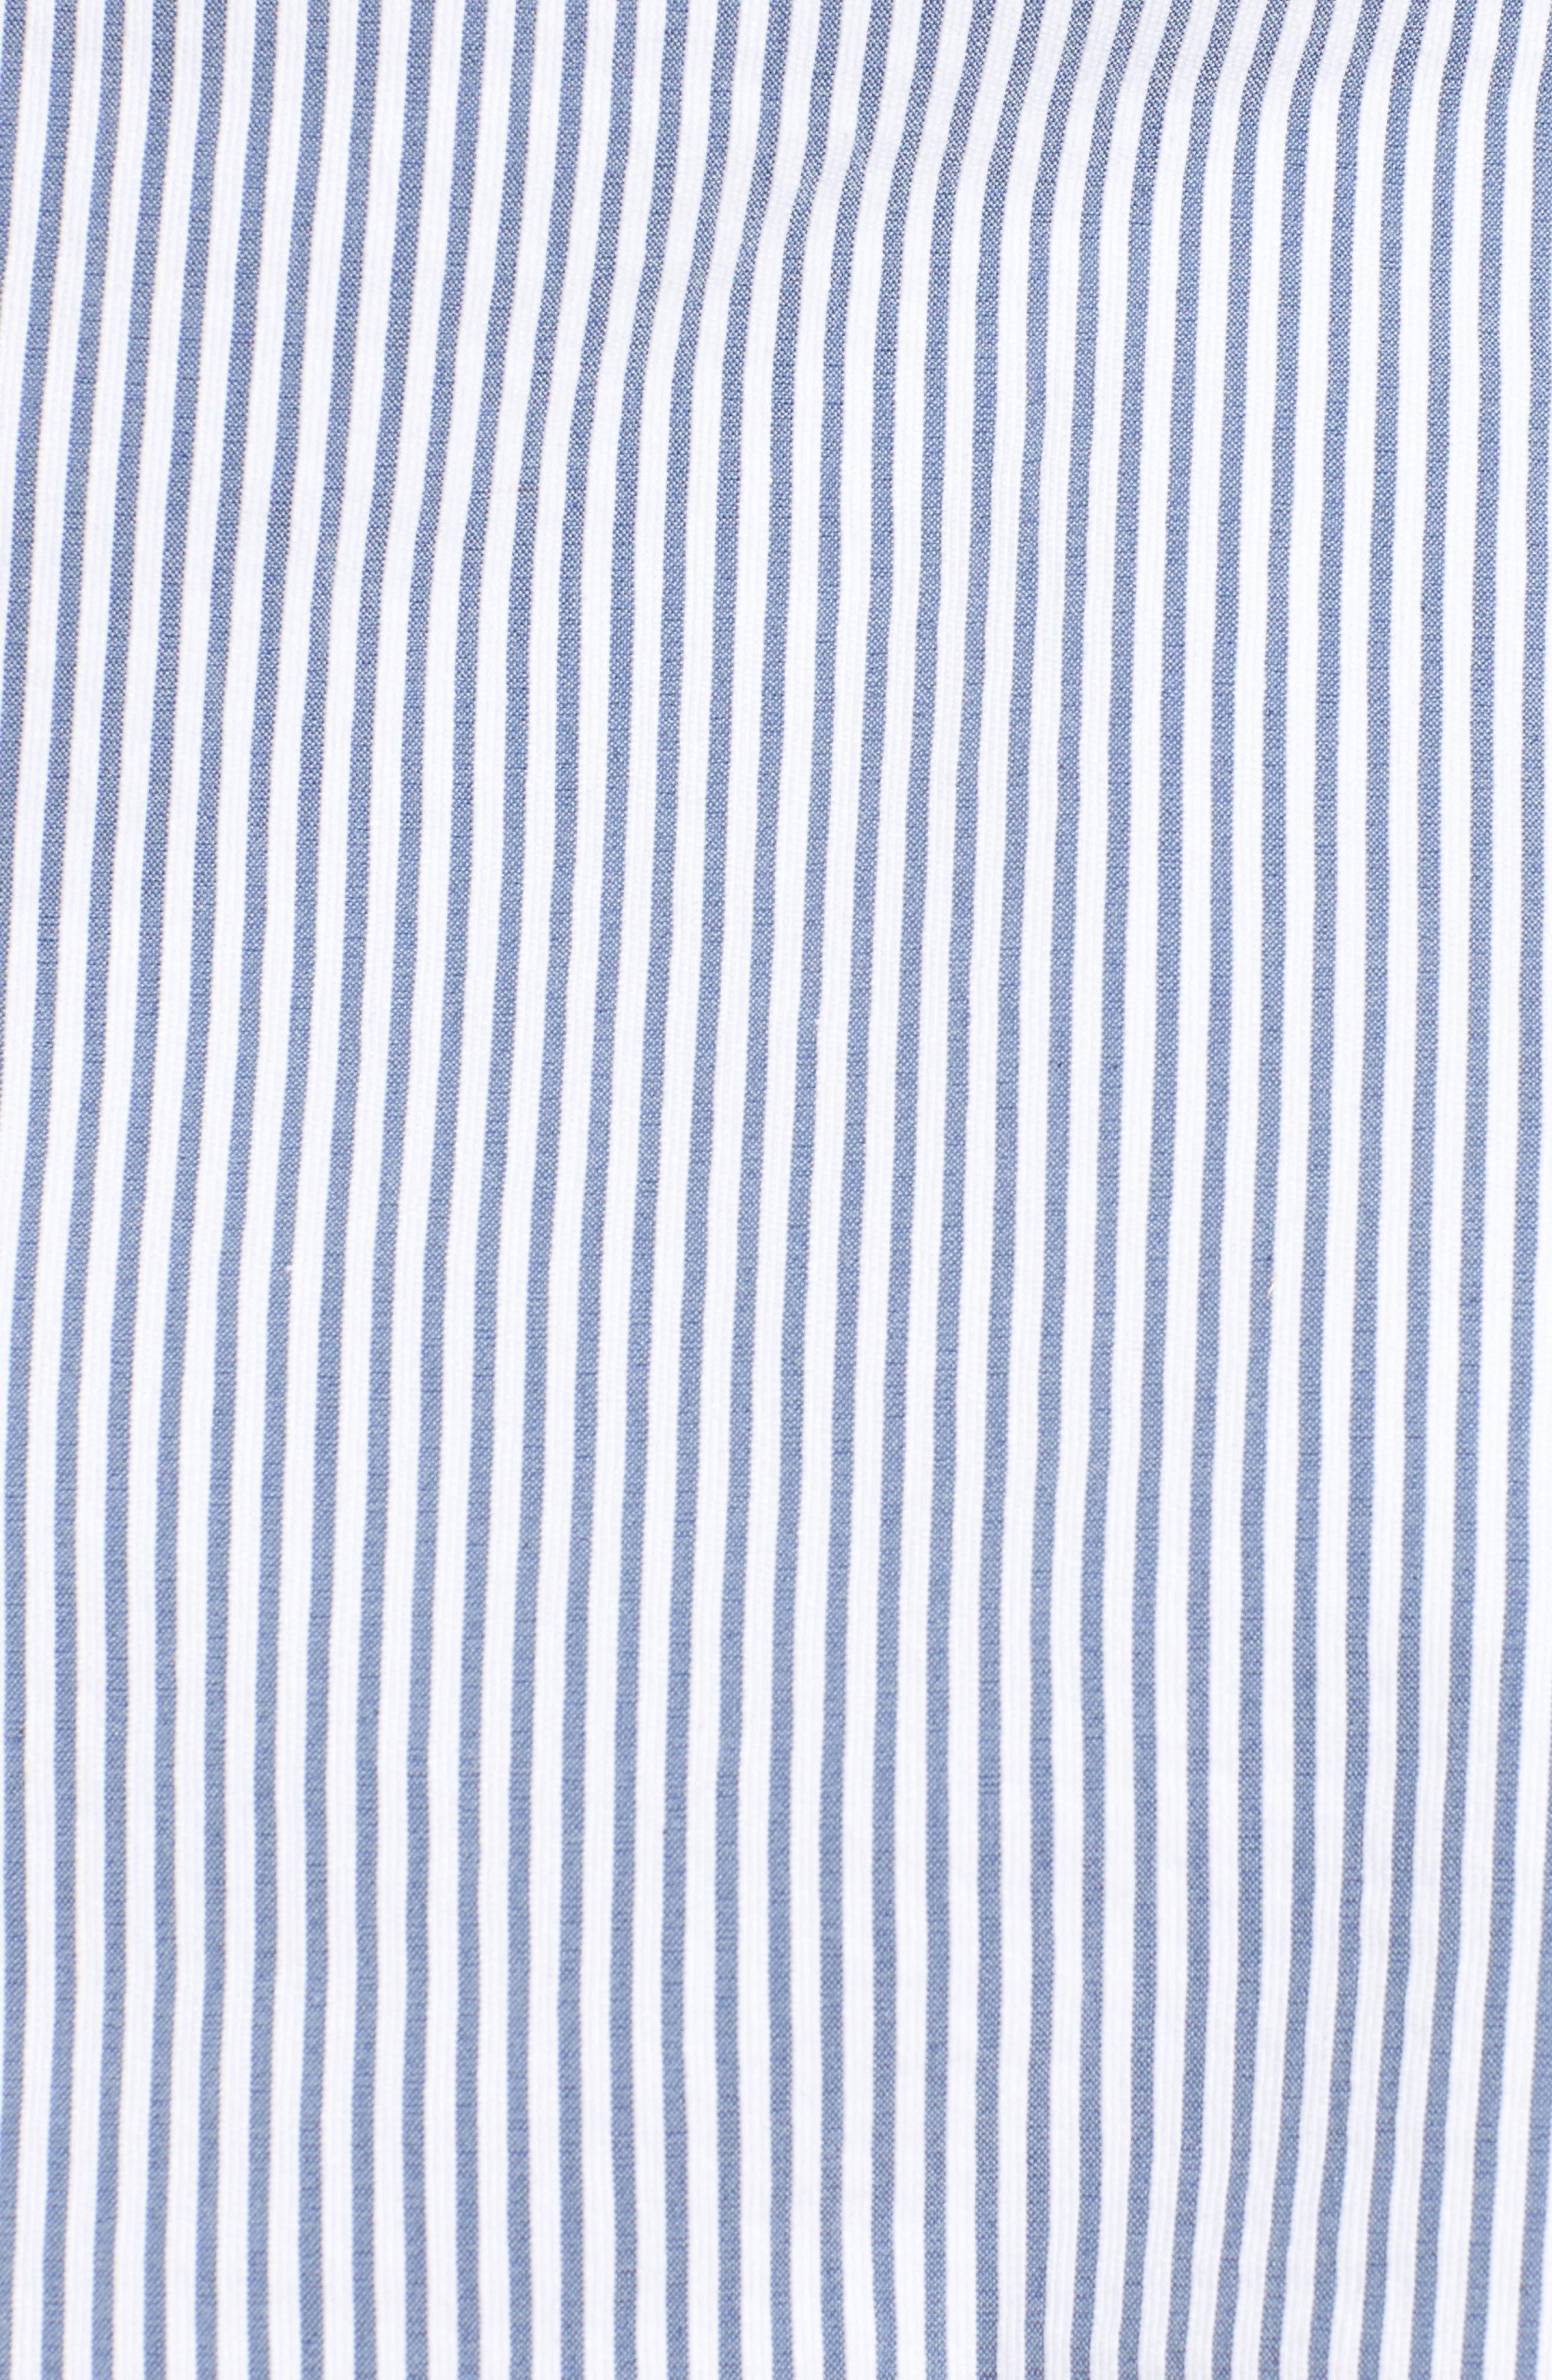 Ruffle Sleeve Open Jacket,                             Alternate thumbnail 5, color,                             Blue- White Seersucker